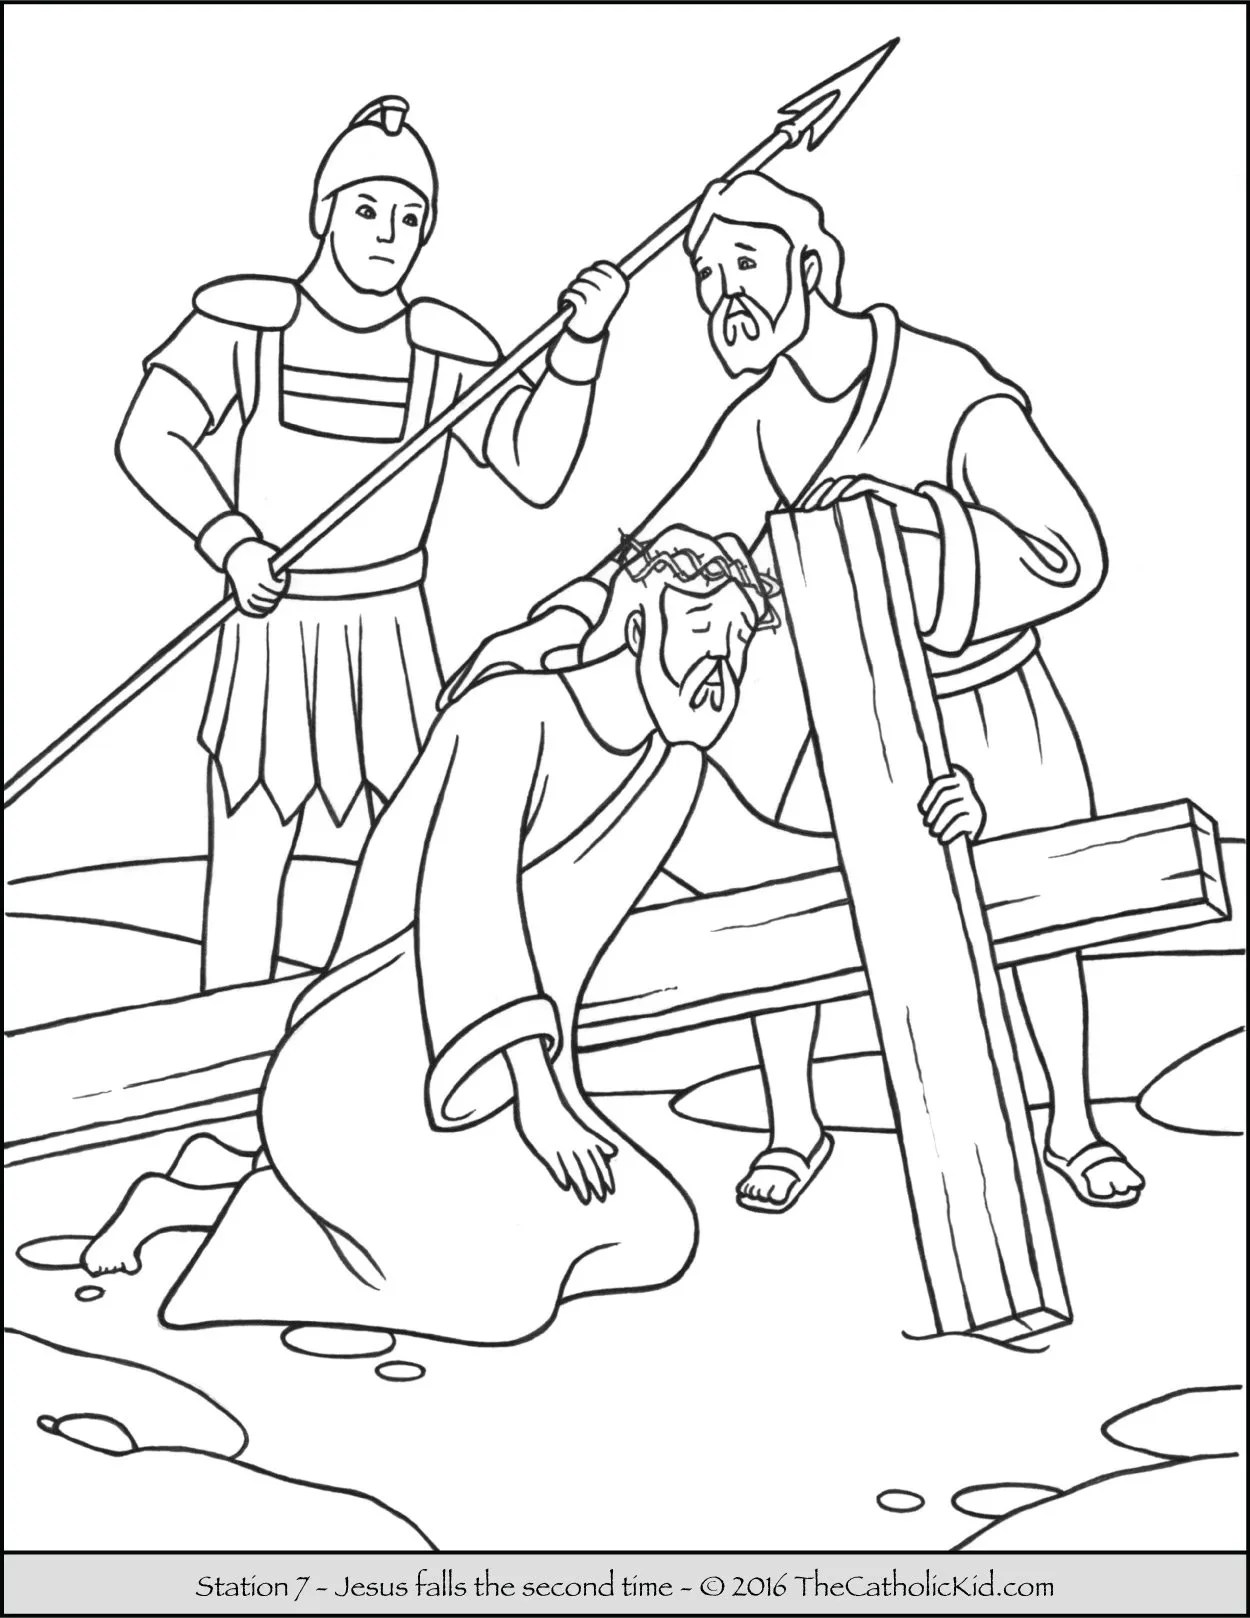 The Big Christian Family Lent